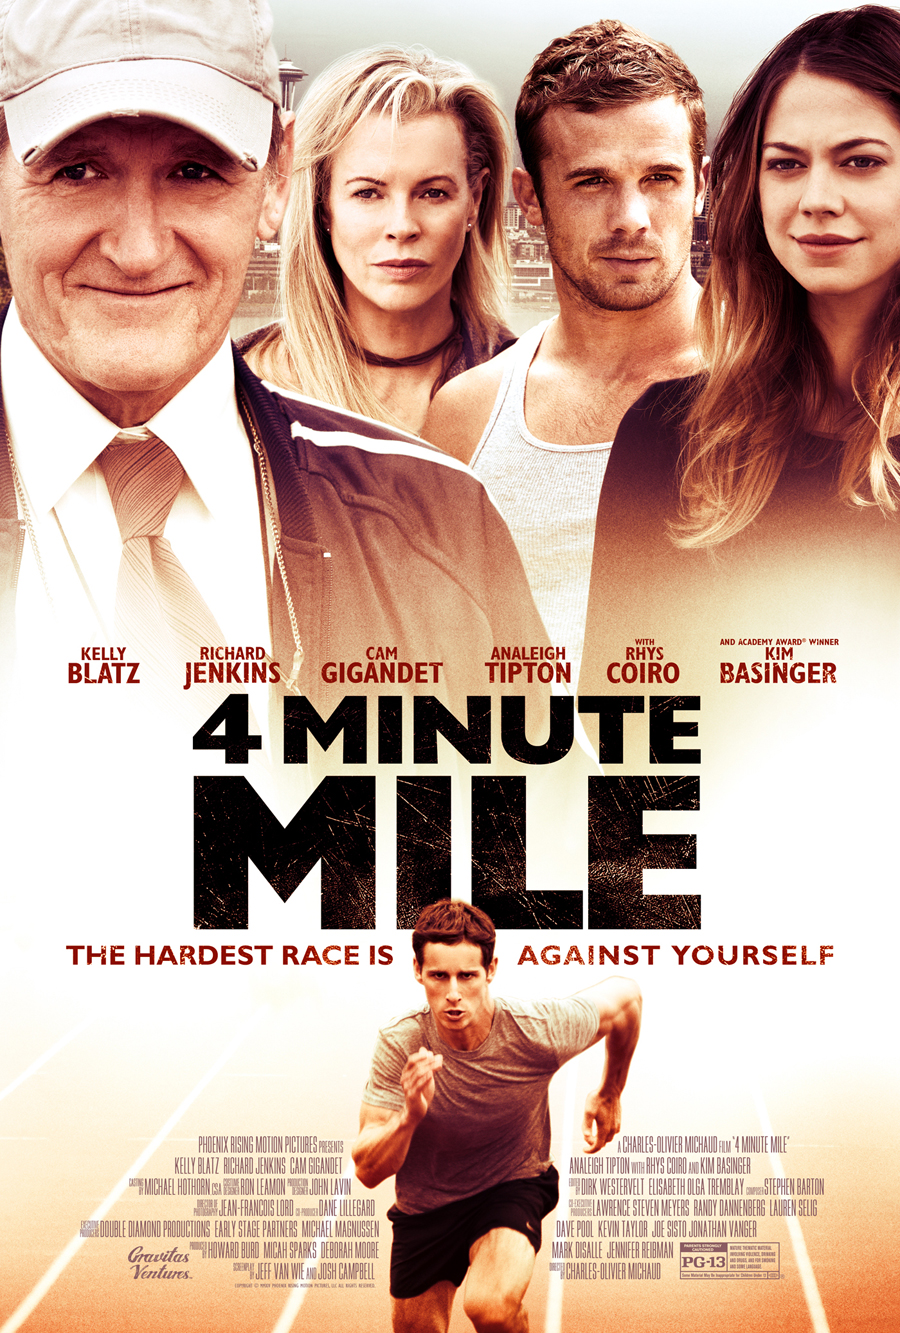 Exclusive: '4 Minute Mile' Poster Premiere!